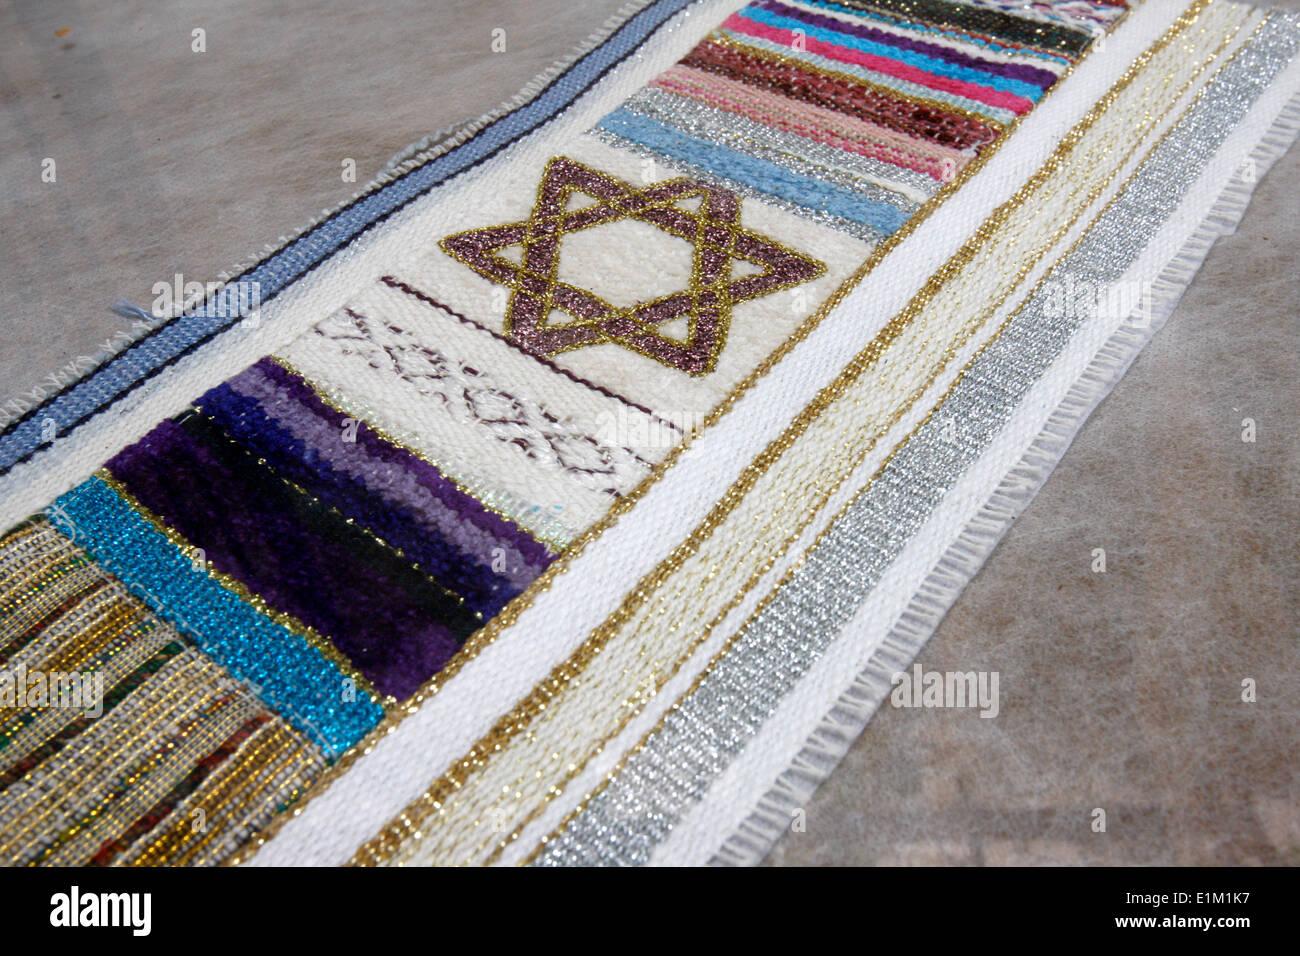 Jewish textile motif - Stock Image